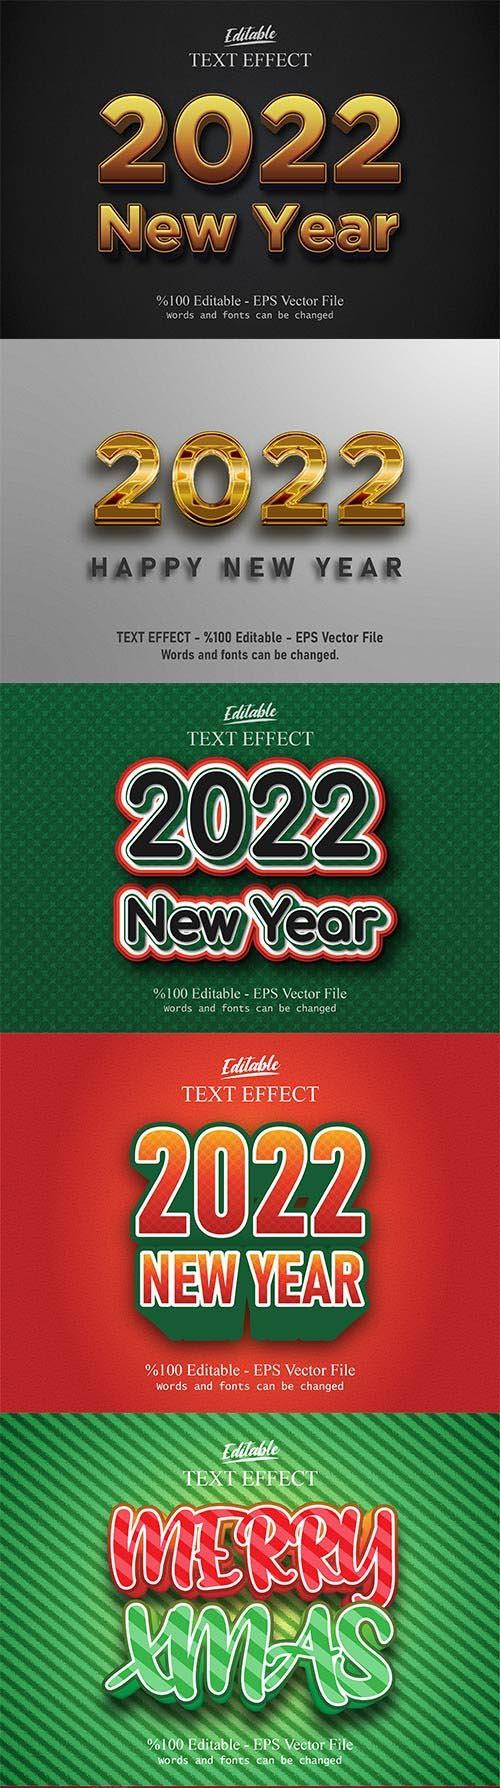 2022 New year, Merry christmas editable text effect premium vector vol 4